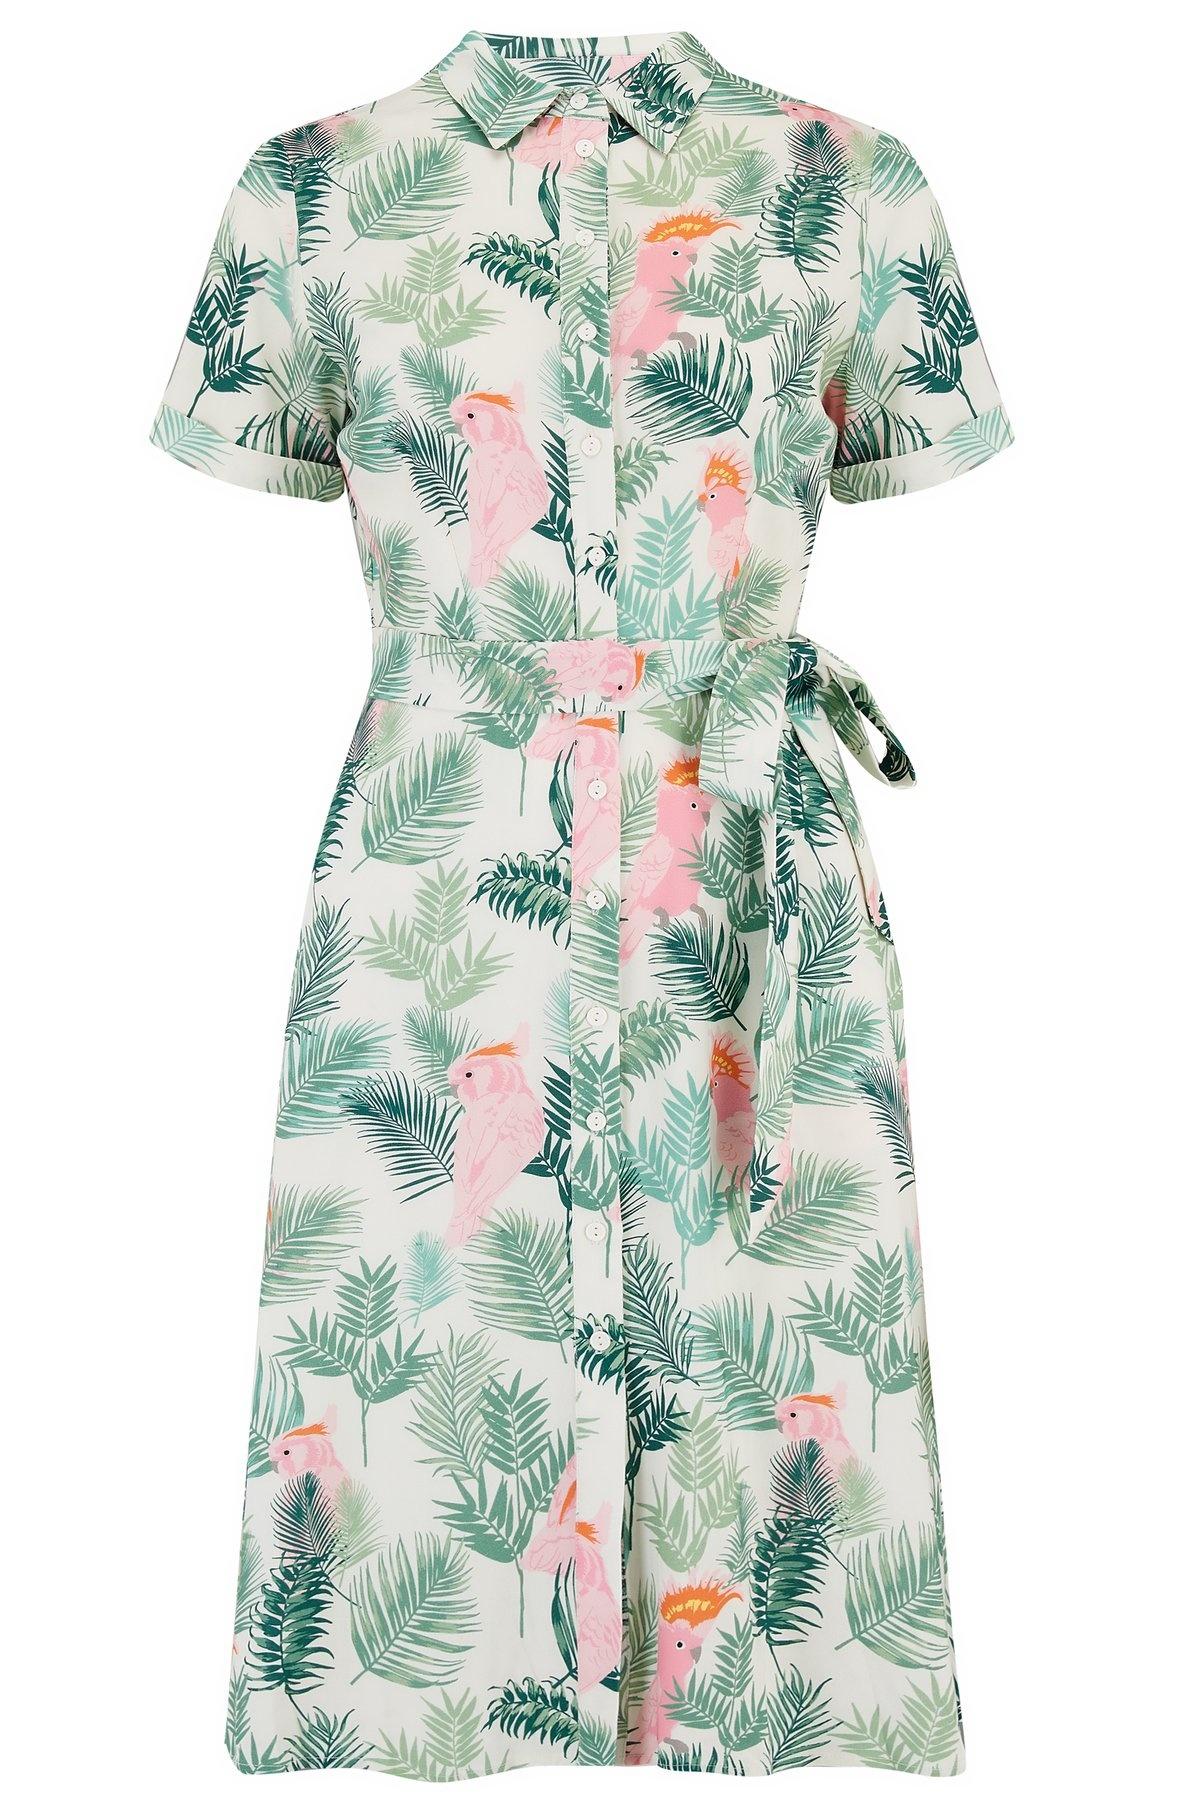 Sugarhill Brighton Abby Shirt Dress in Cockatoo